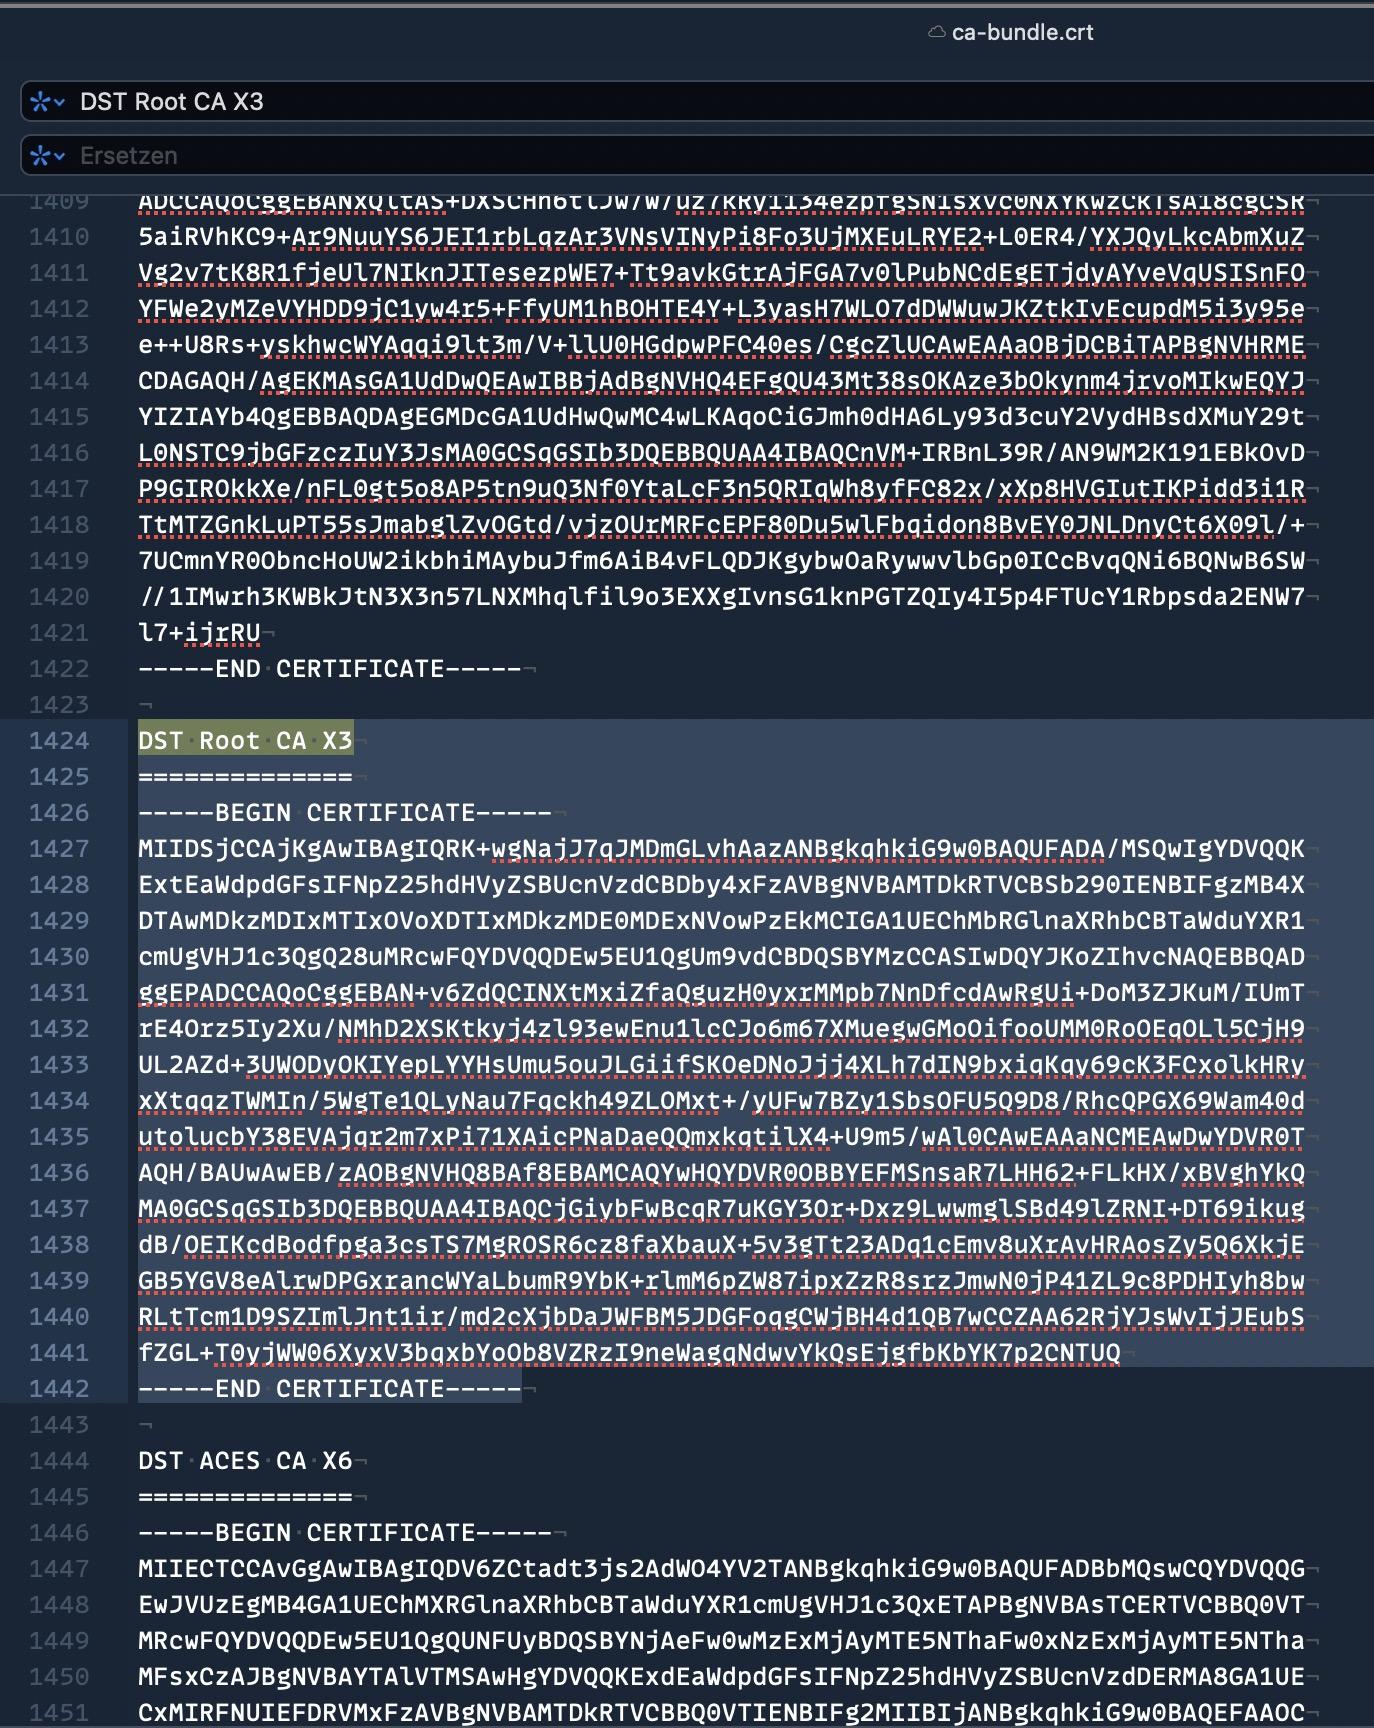 Probleme bei WordPressupdate: cURL error 60 SSL certificate problem certificate has expired